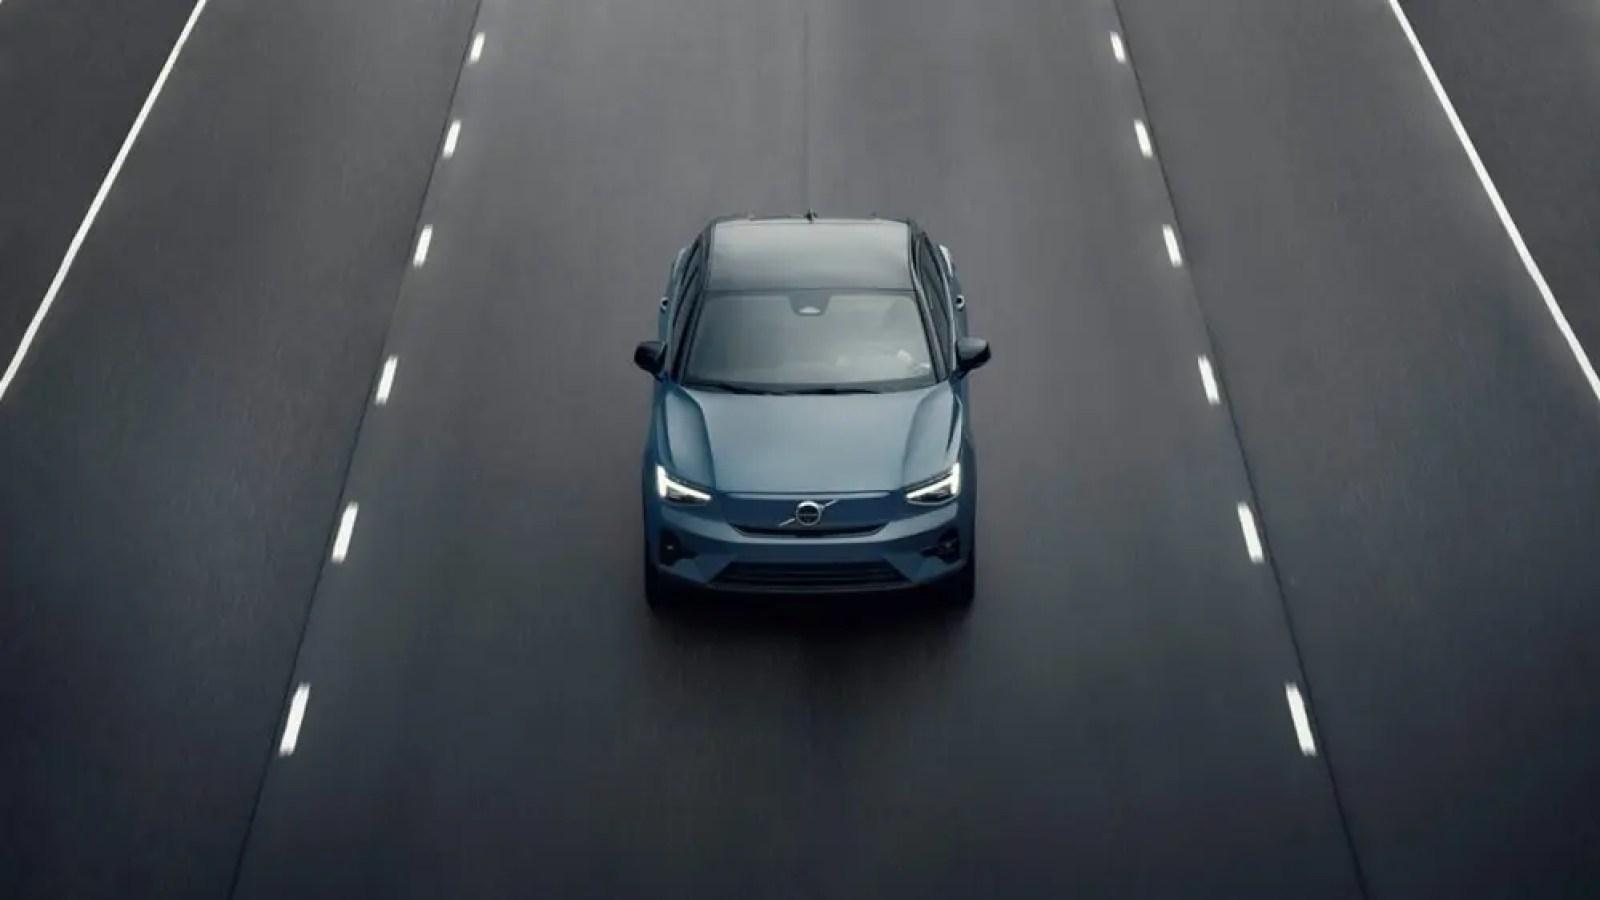 The Volvo C40 electric vehicle.